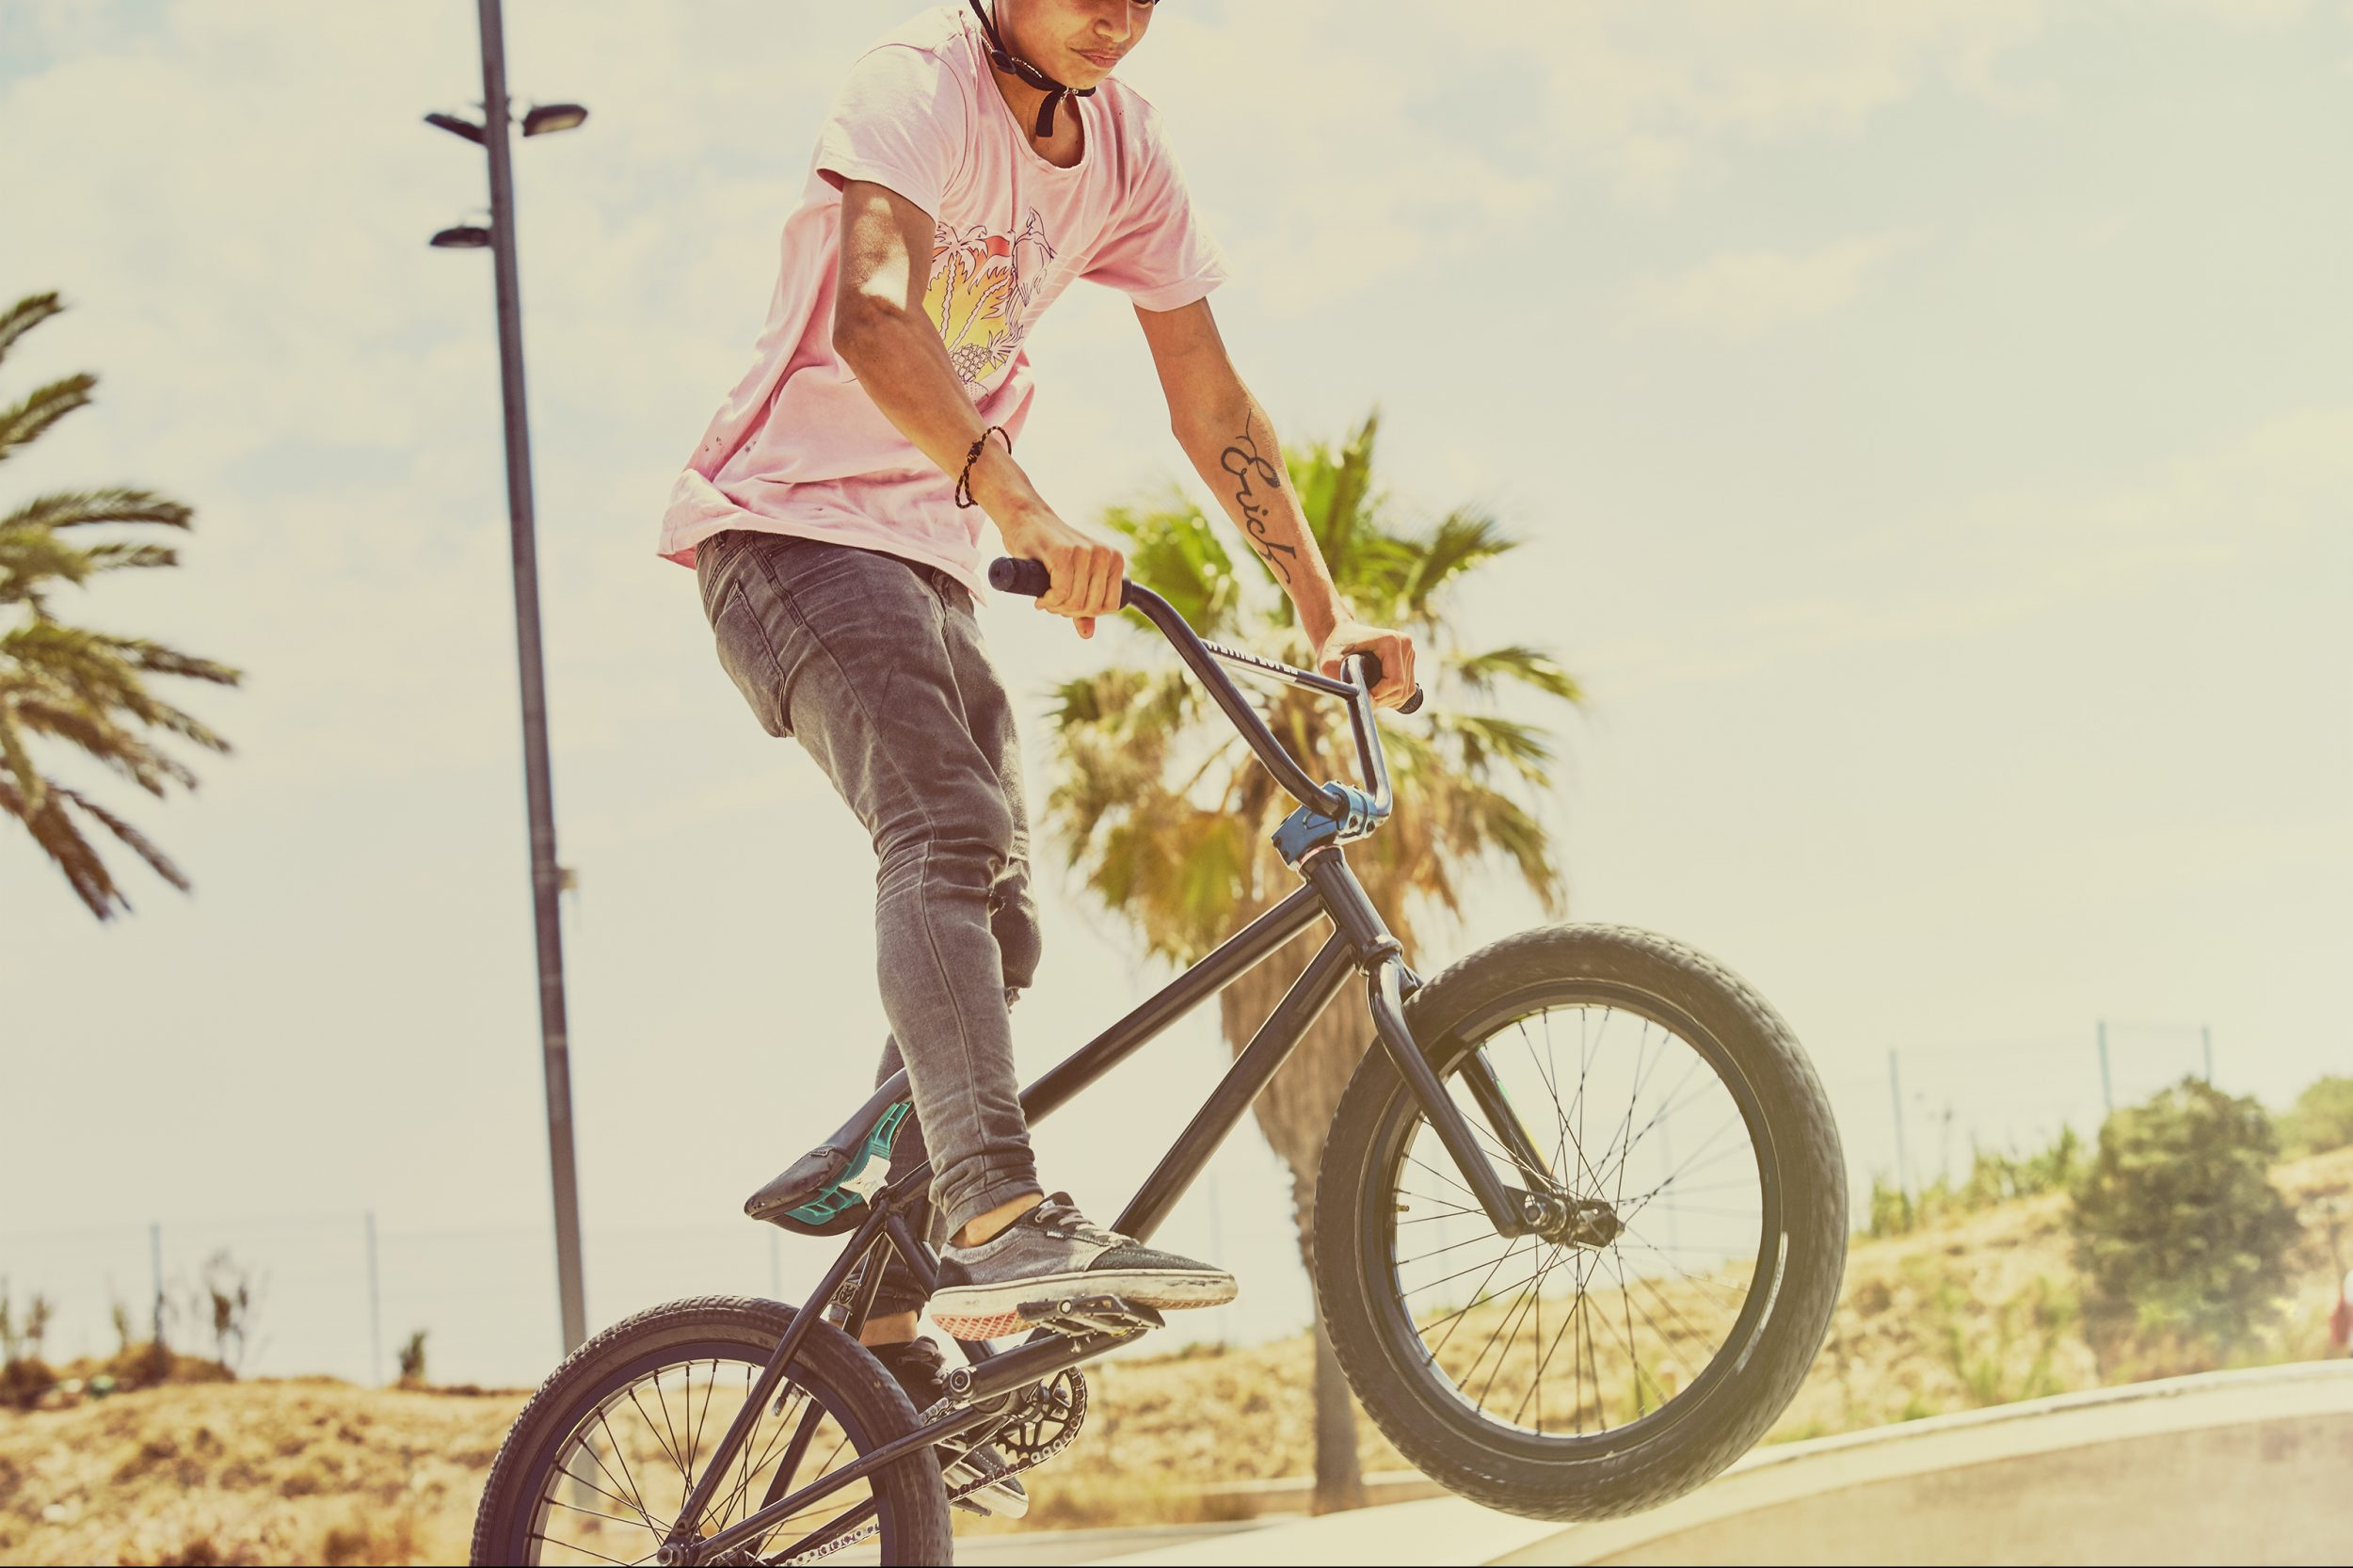 BMX rider catching some air at Barcelona skatepark